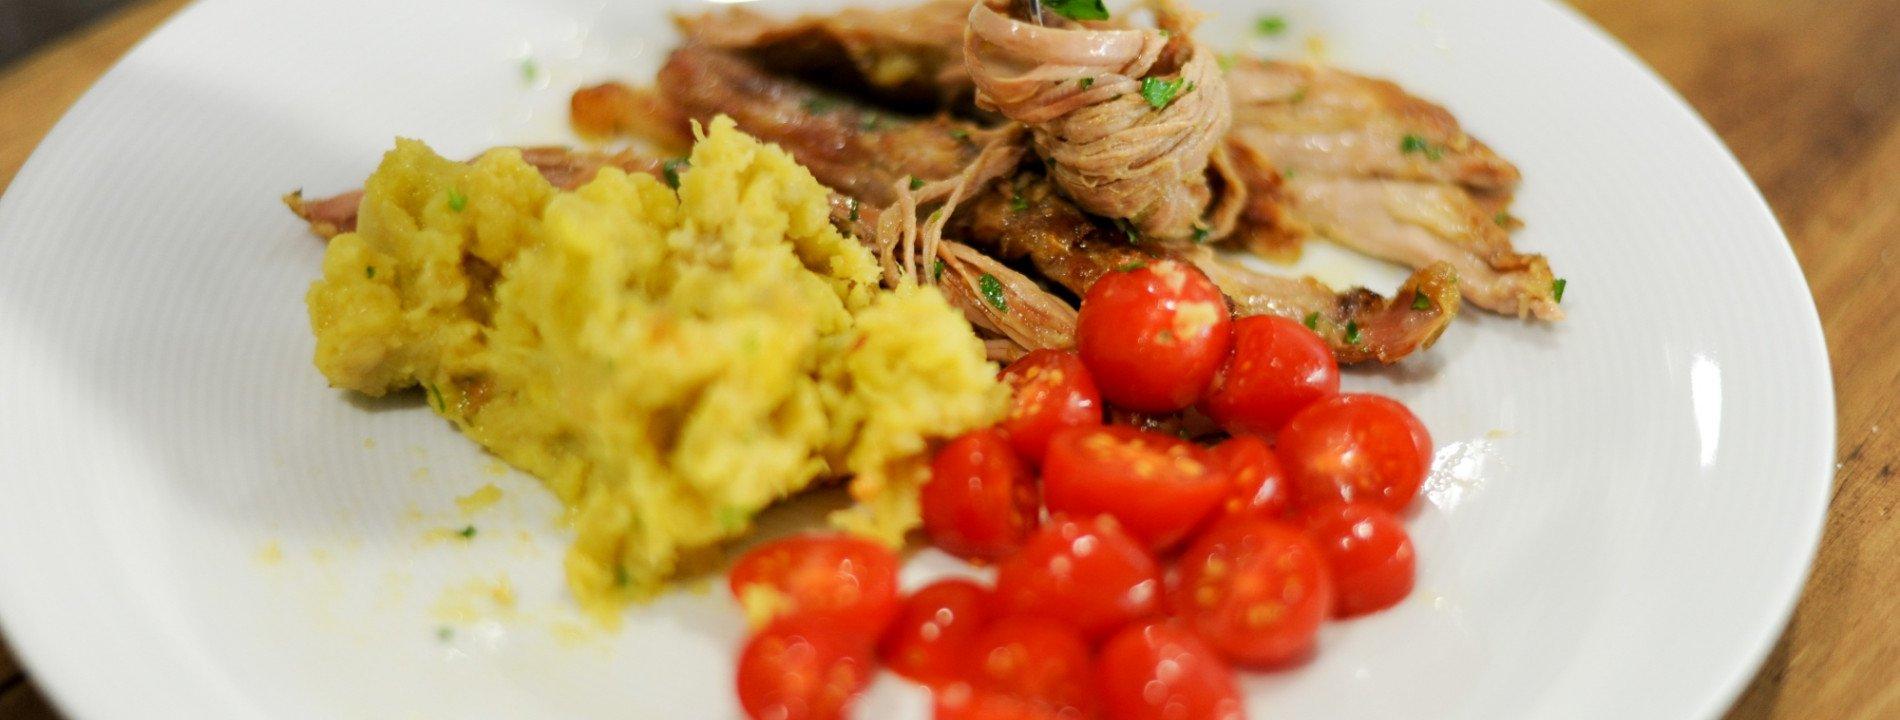 Duroc Pork Tenderloins with Sweet Potato